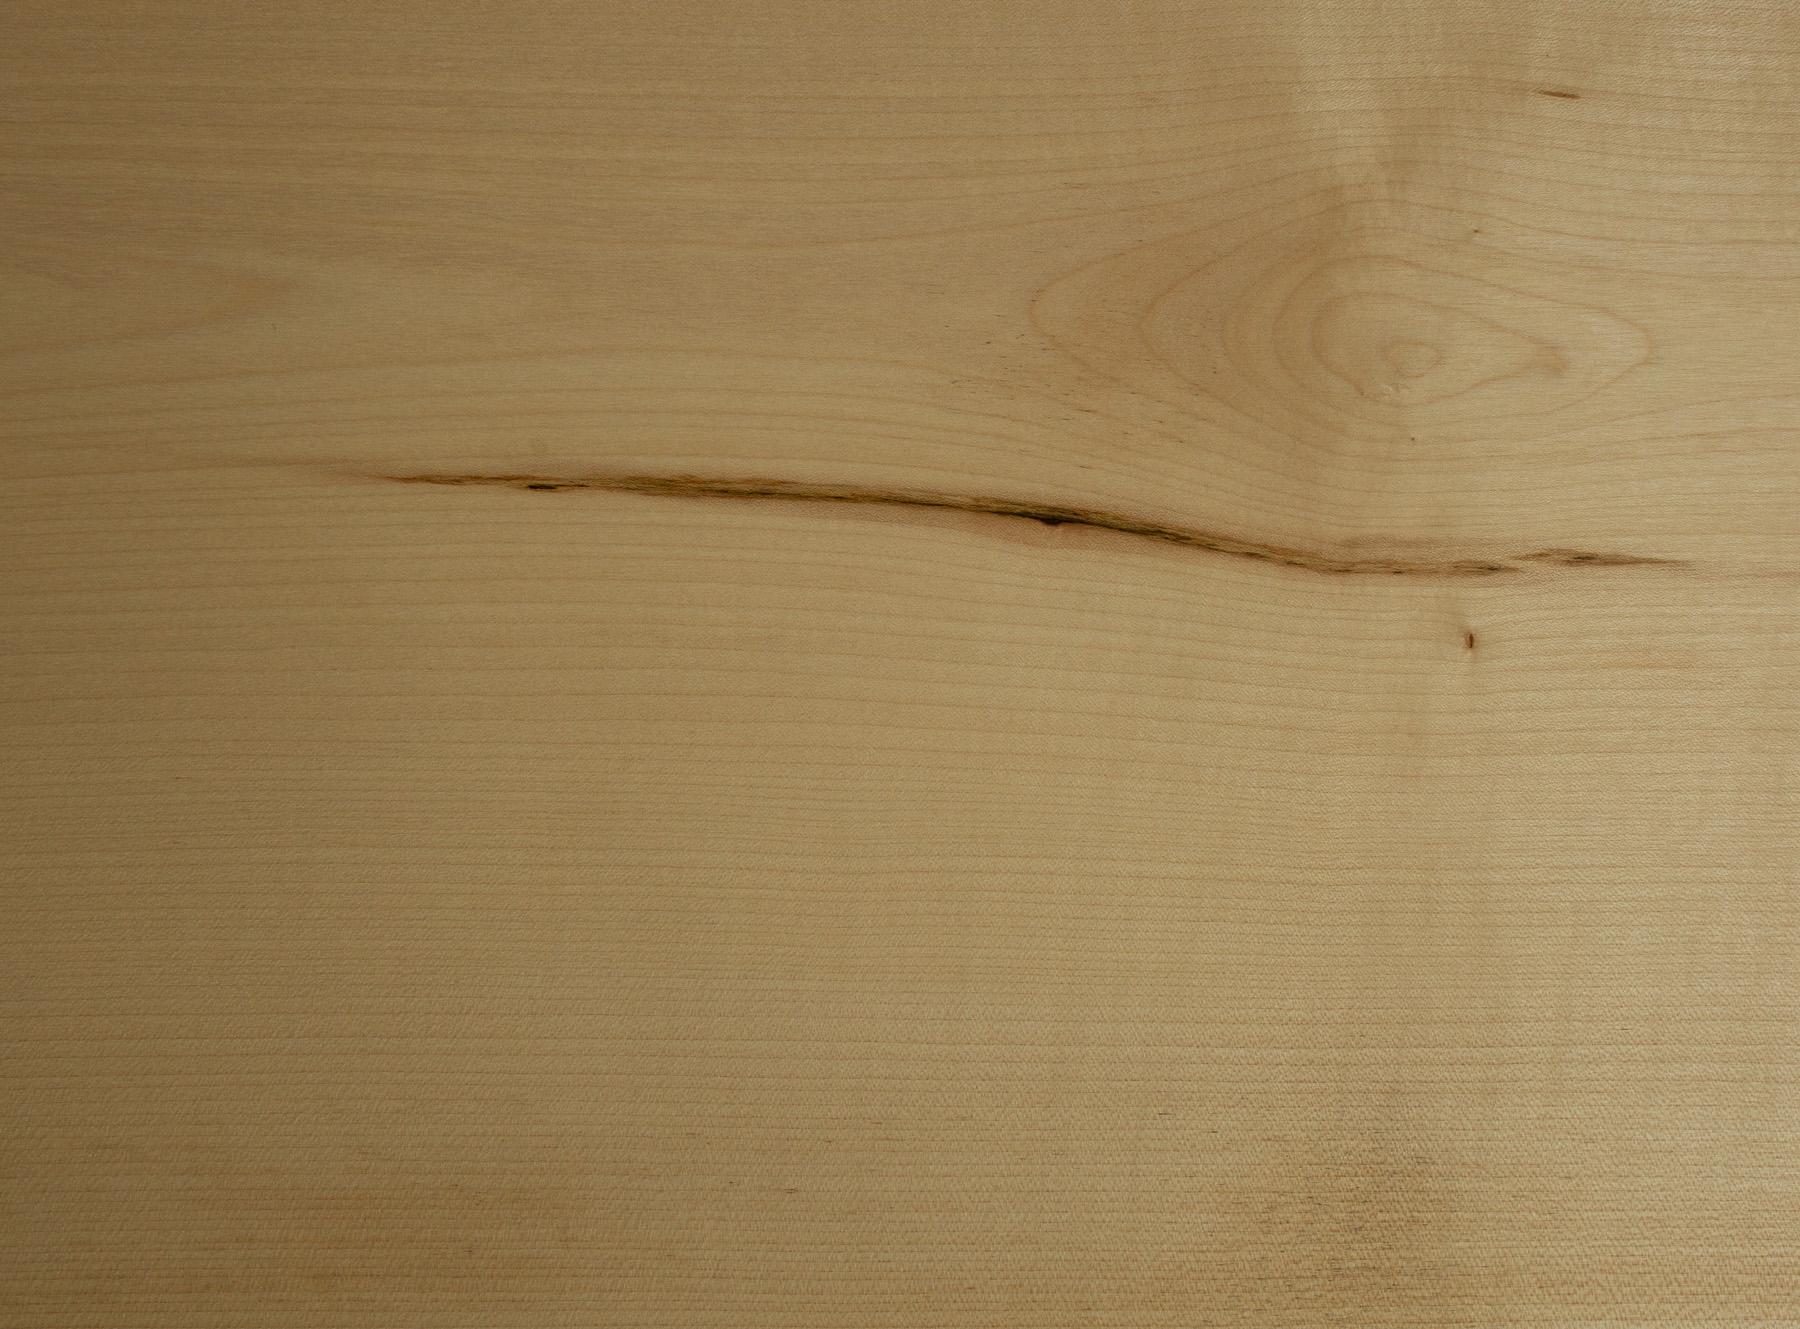 Holz mit Ast